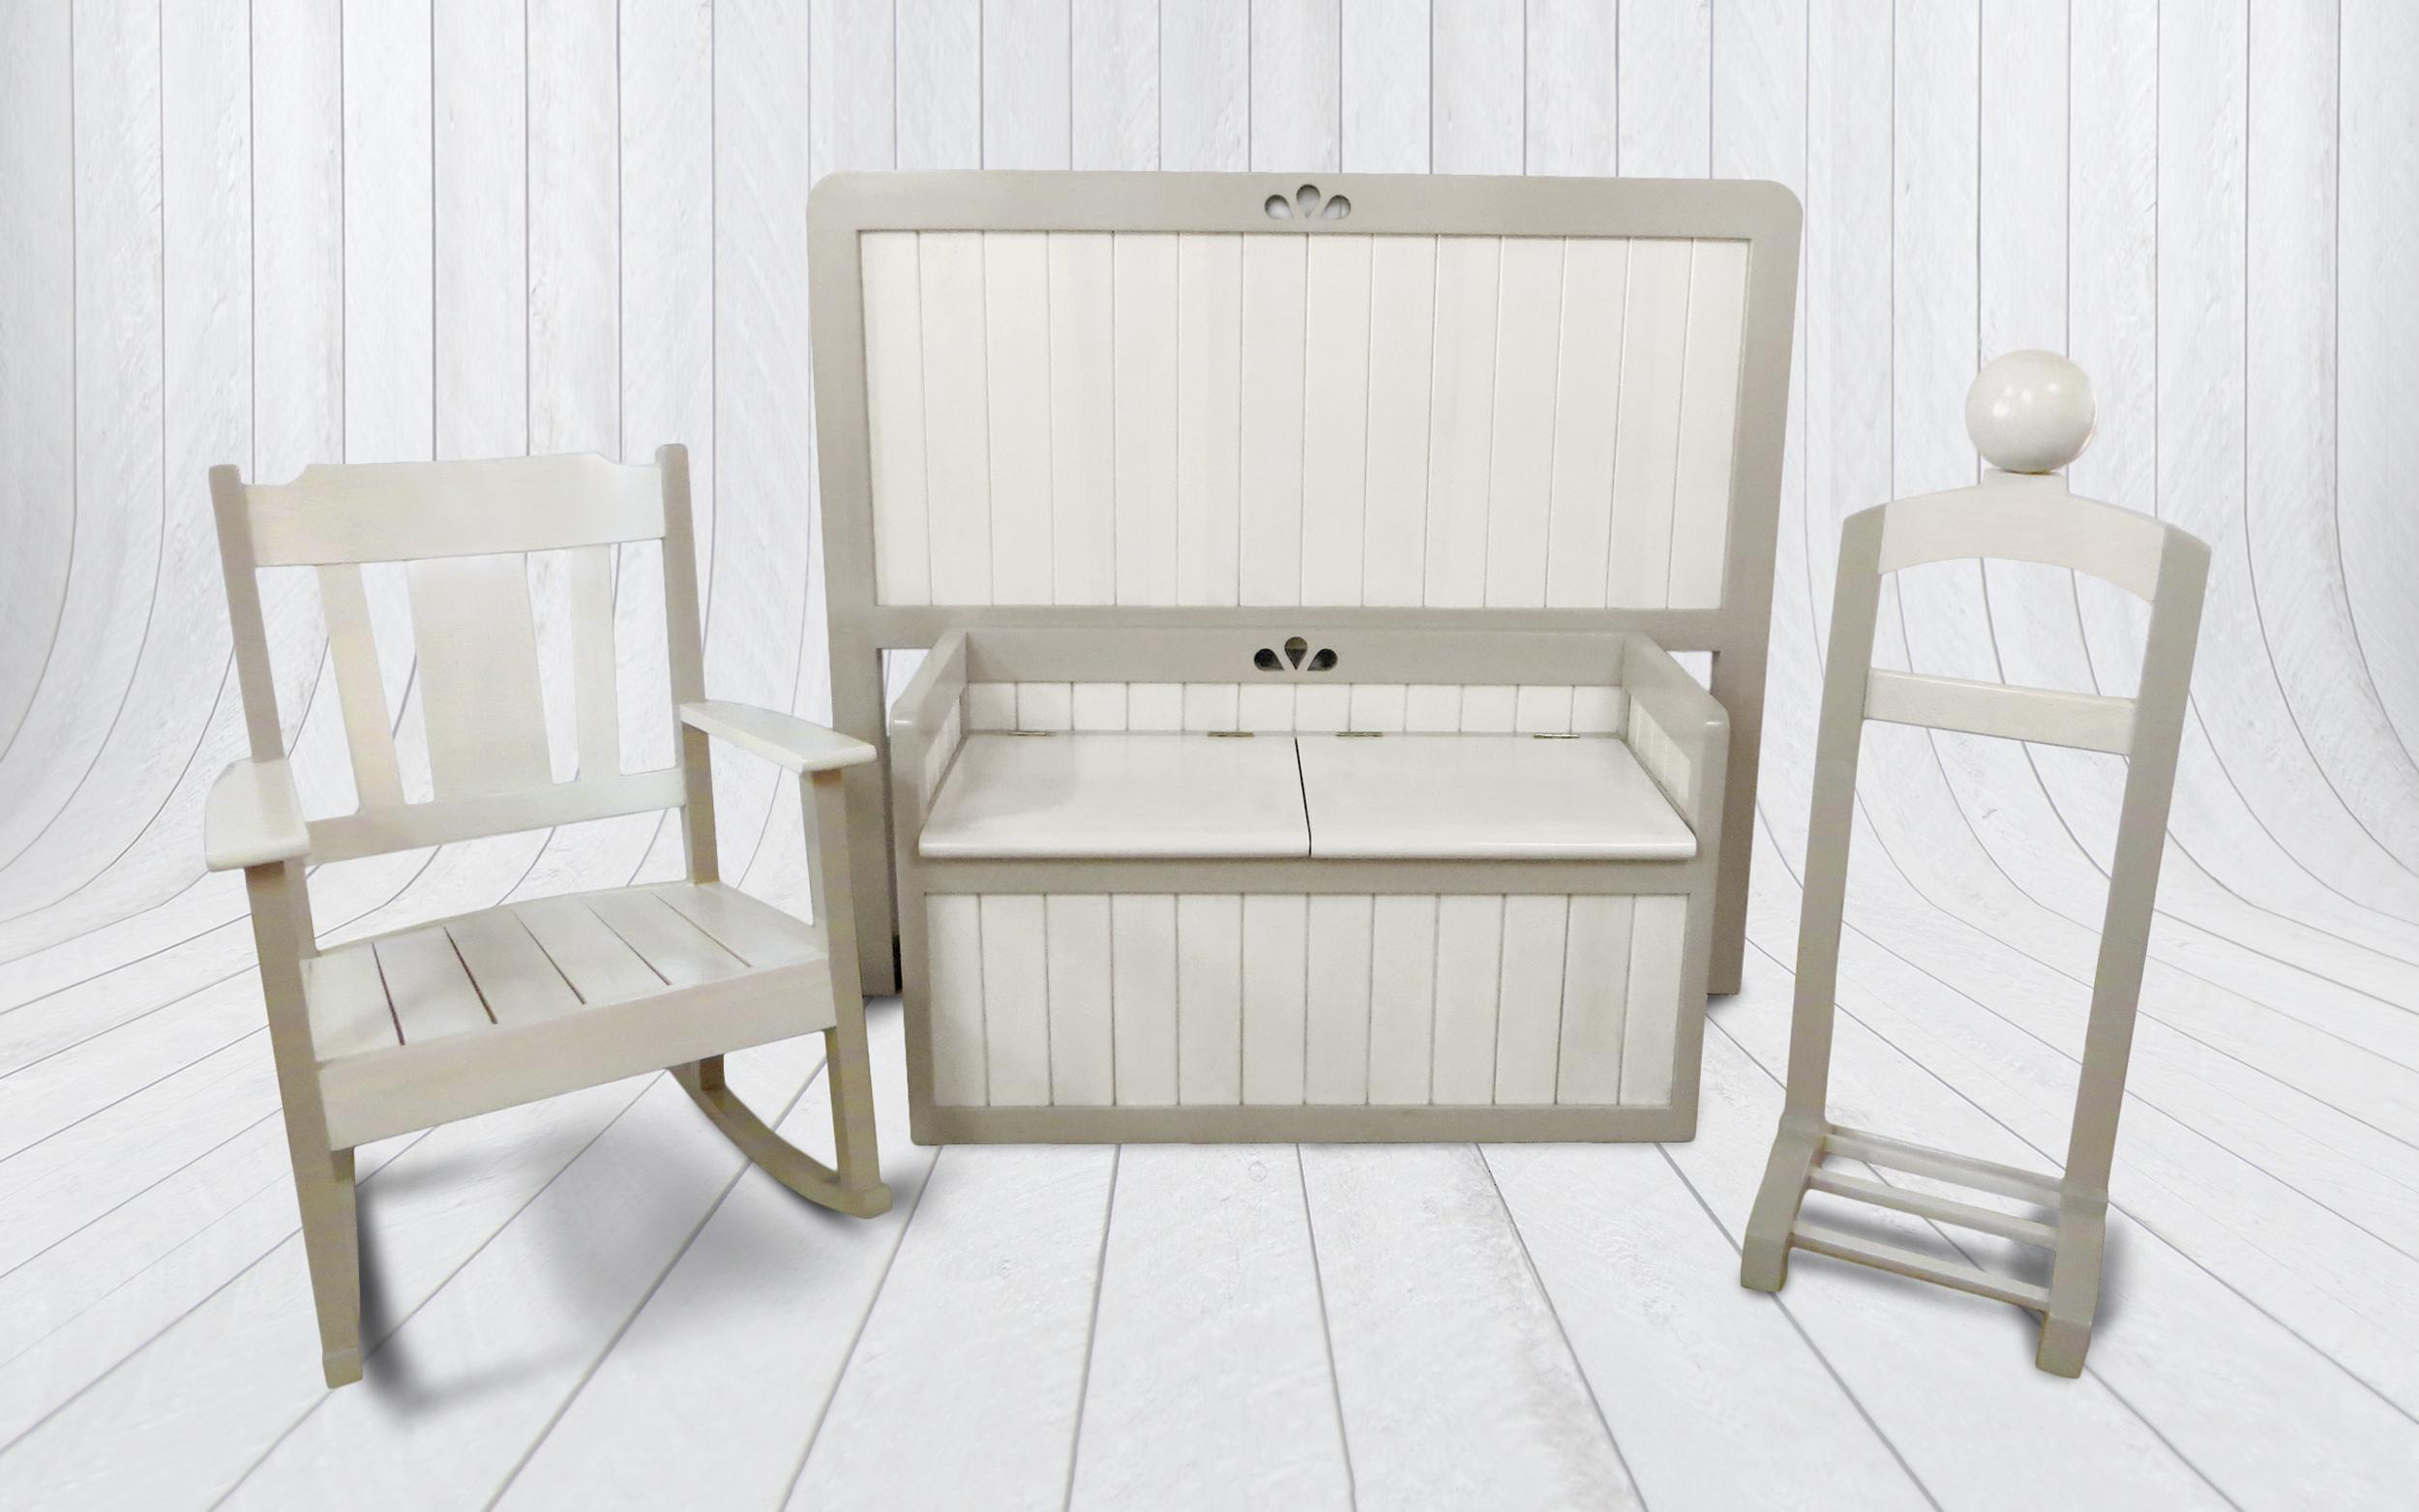 muebles-tap-color-nuez y marfil.jpg